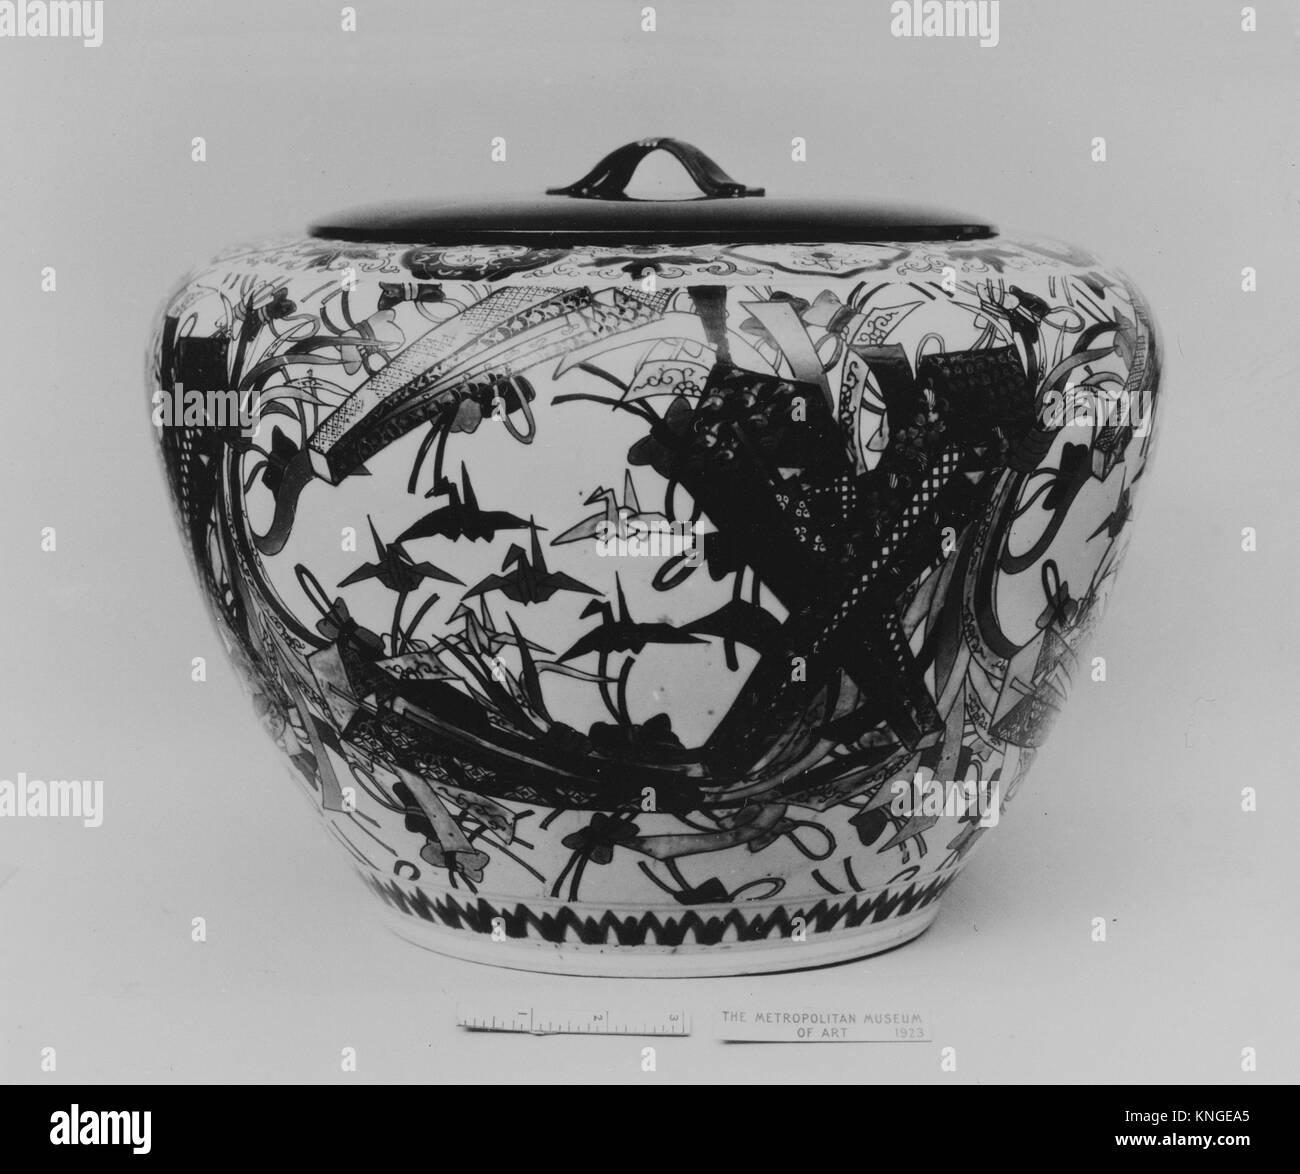 datation Imari porcelaine matchmaking en ligne gratuit en hindi